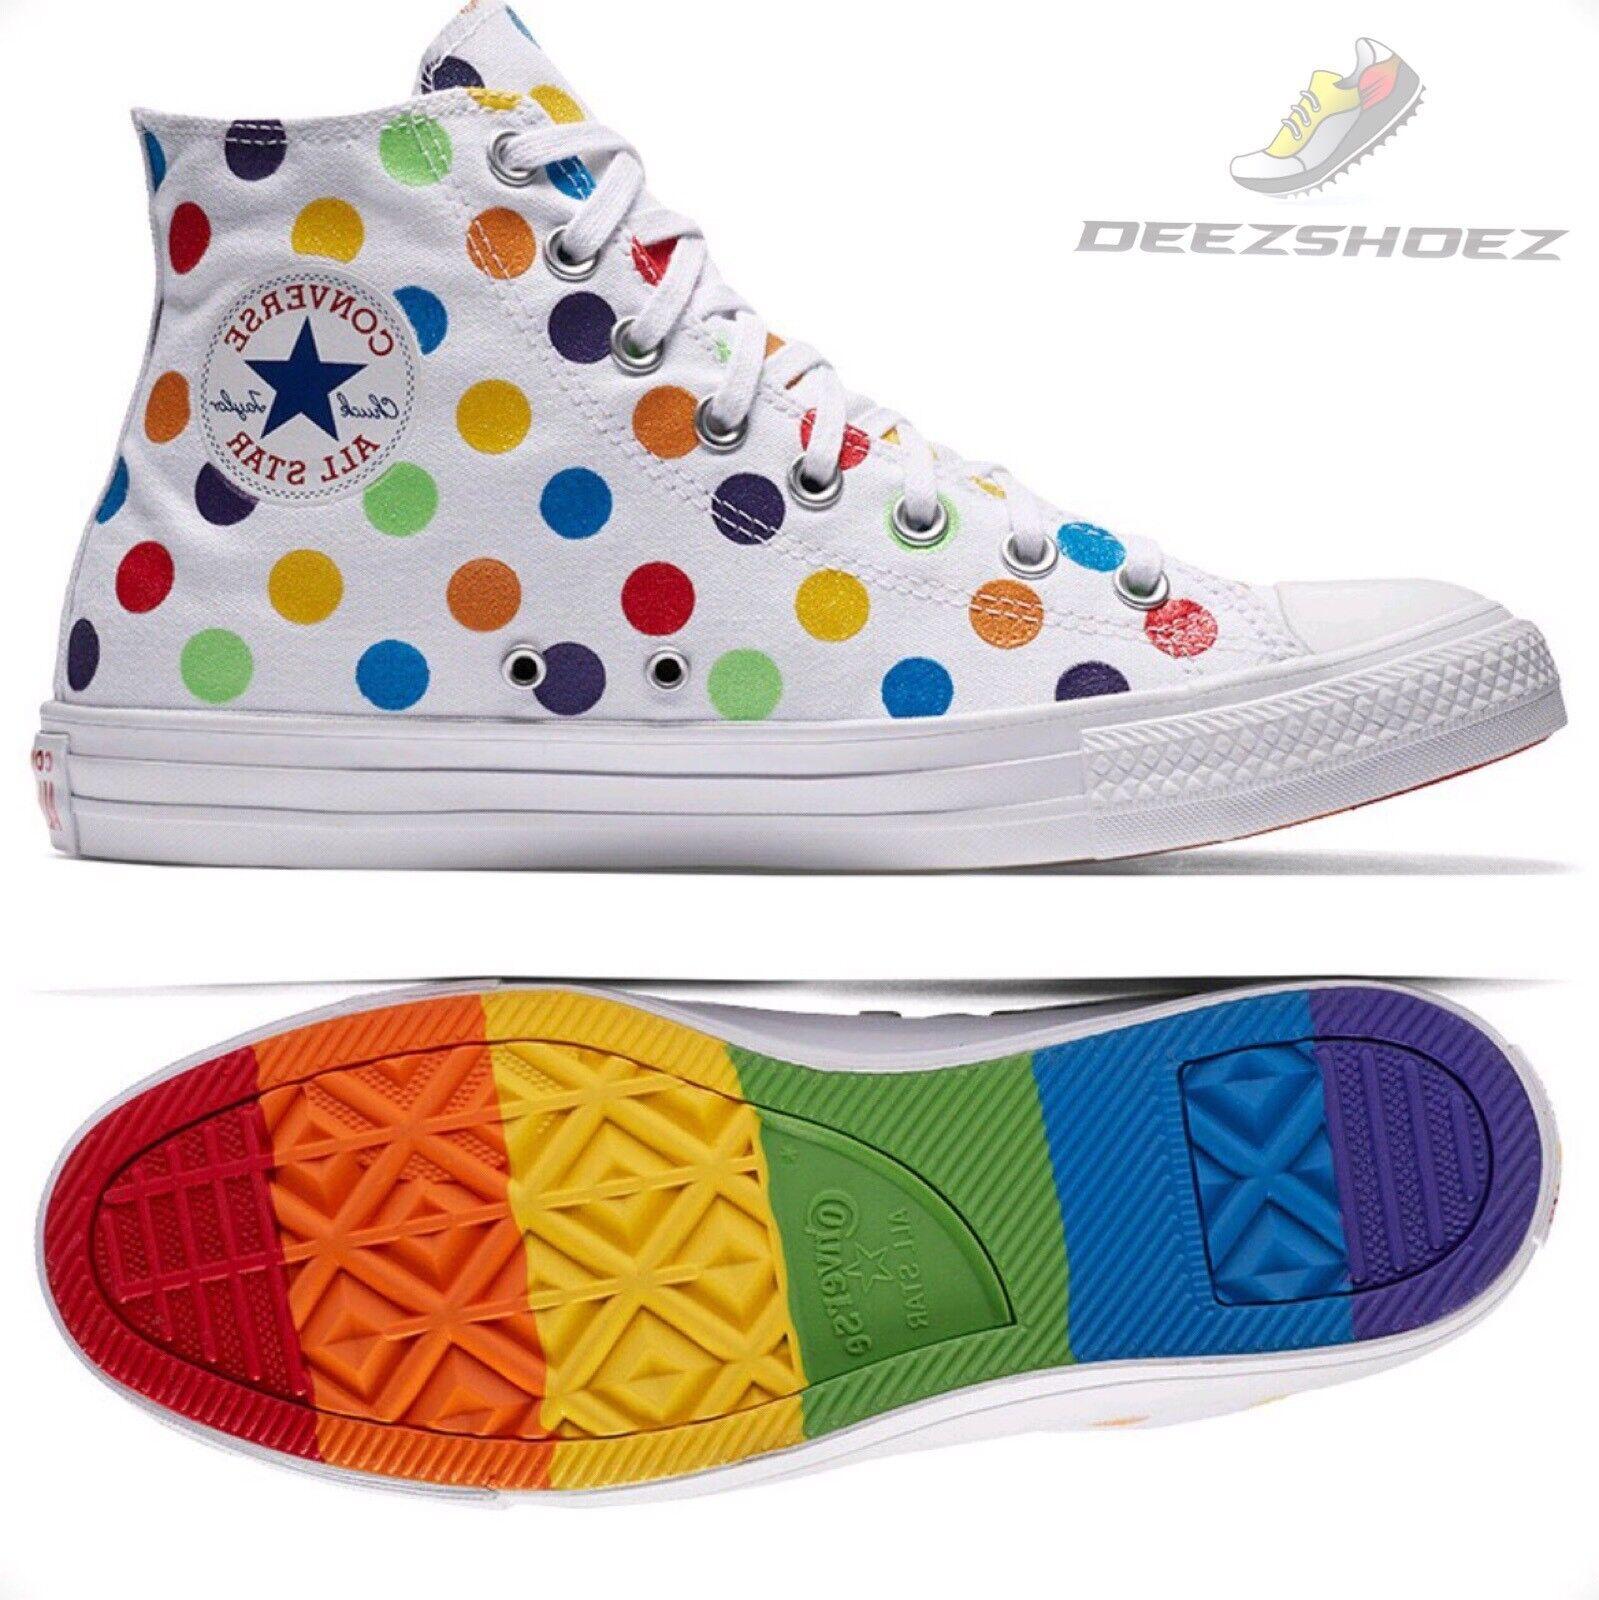 Converse Miley Cyrus PRIDE Dots Chuck Taylor white Unisex Us Size 10